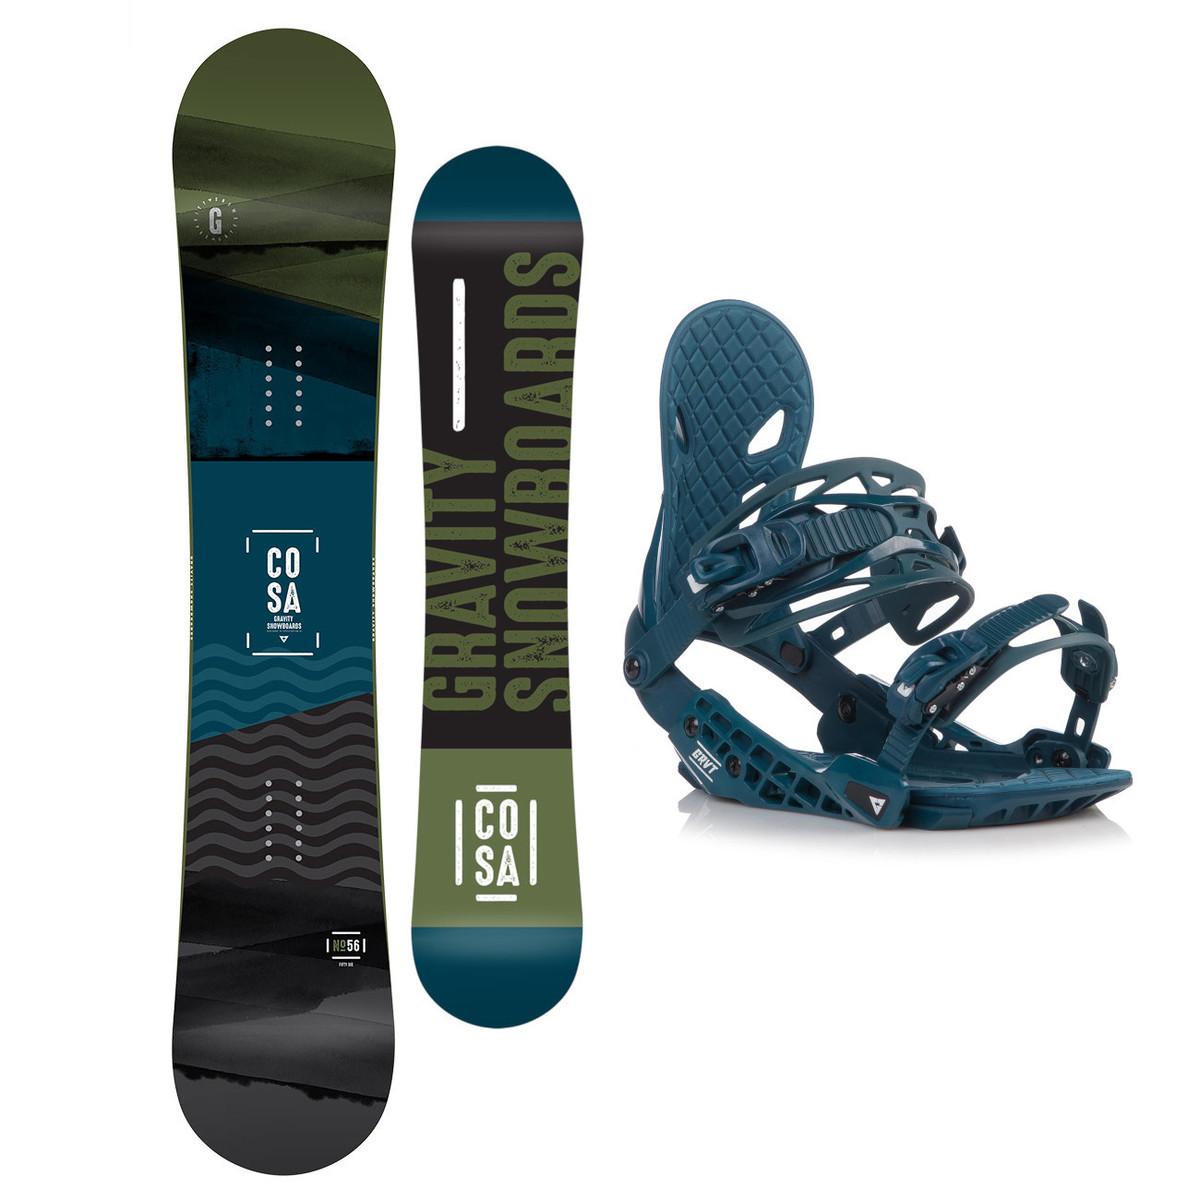 Snowboardový set Gravity Cosa 18/19 L (EU 42-48) 163W